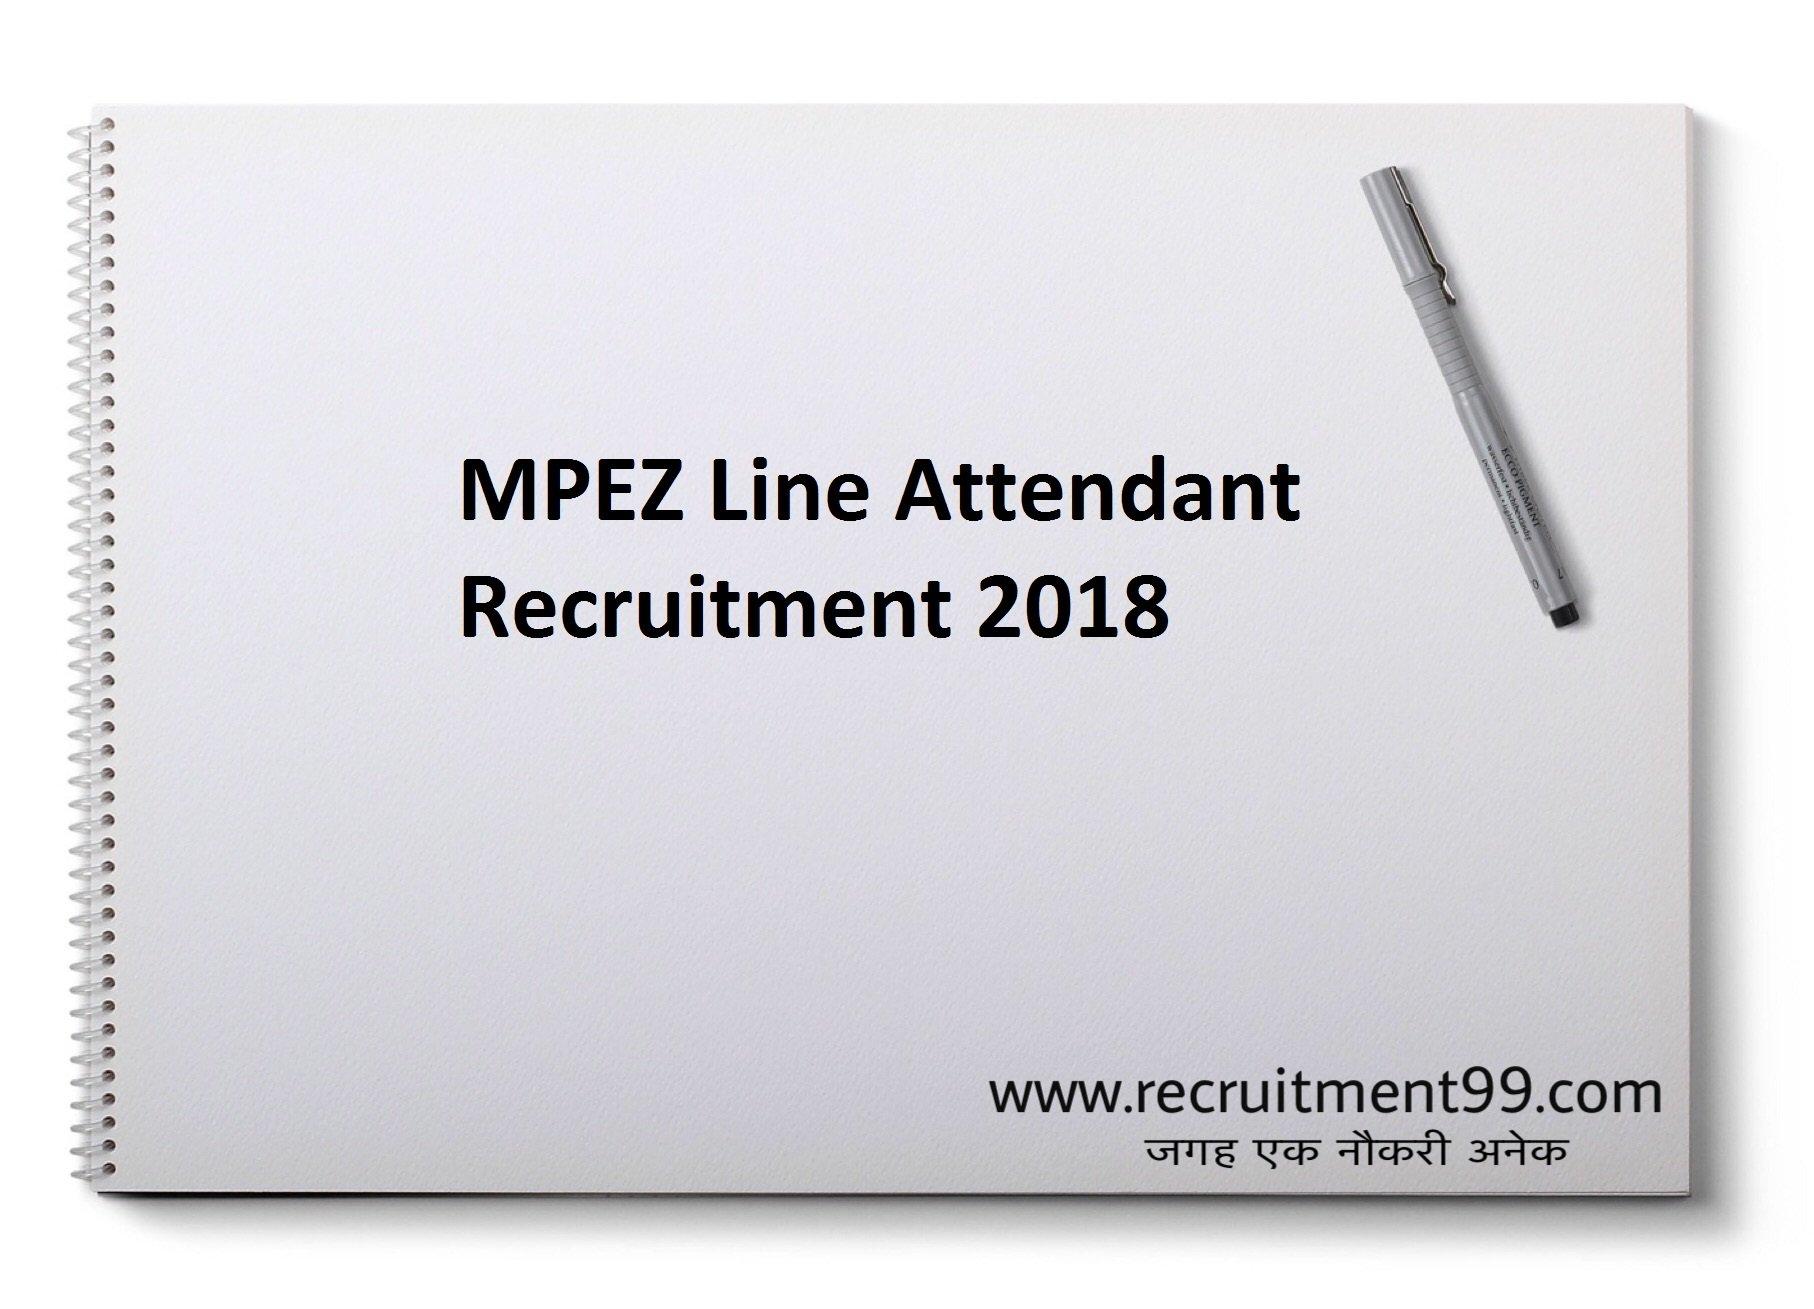 MPEZ Line Attendant Recruitment Admit Card Result 2018